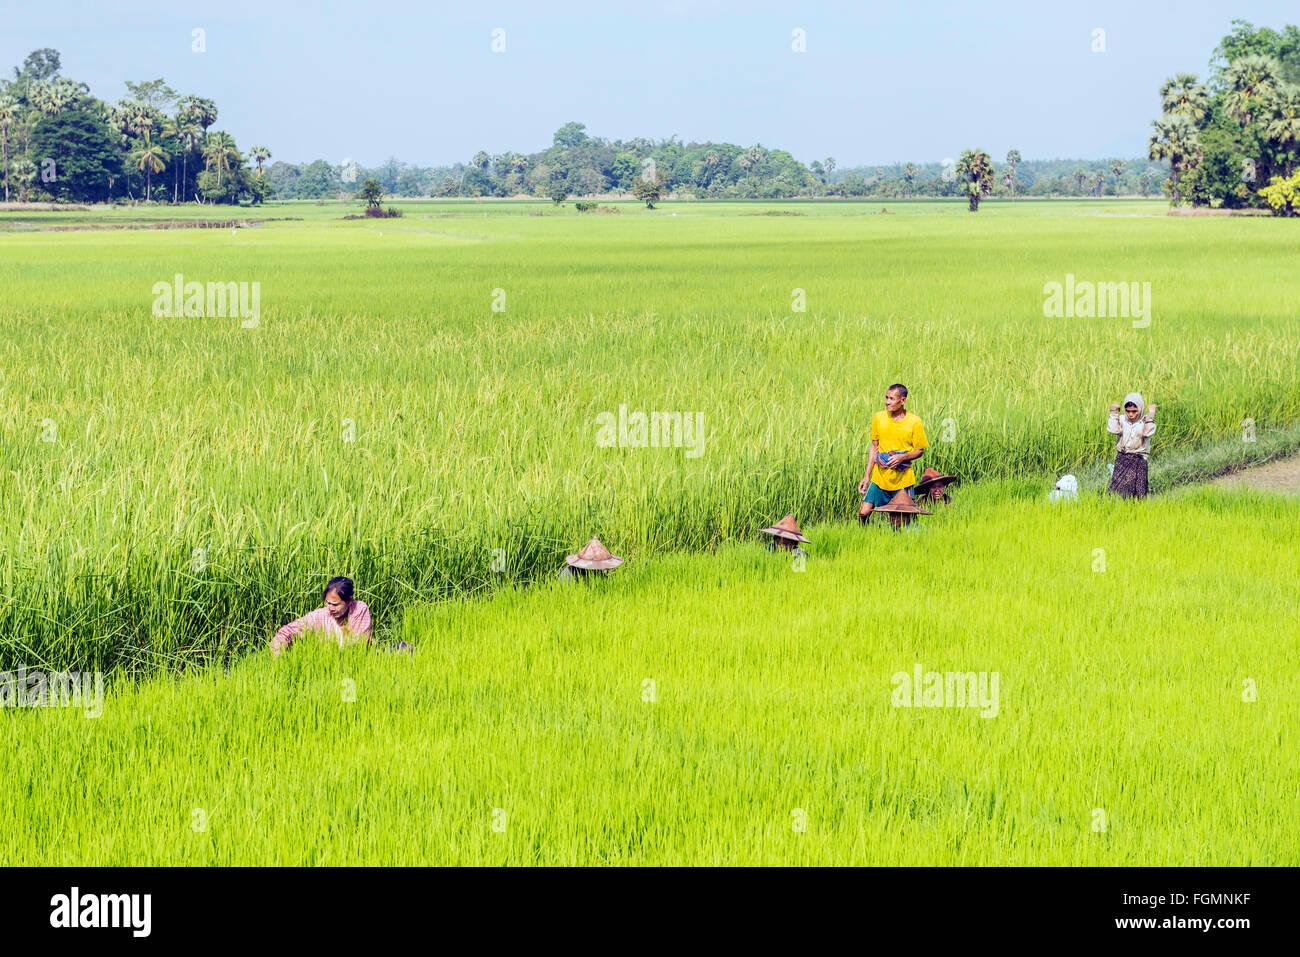 Farmers on a rice field, Burma - Stock Image